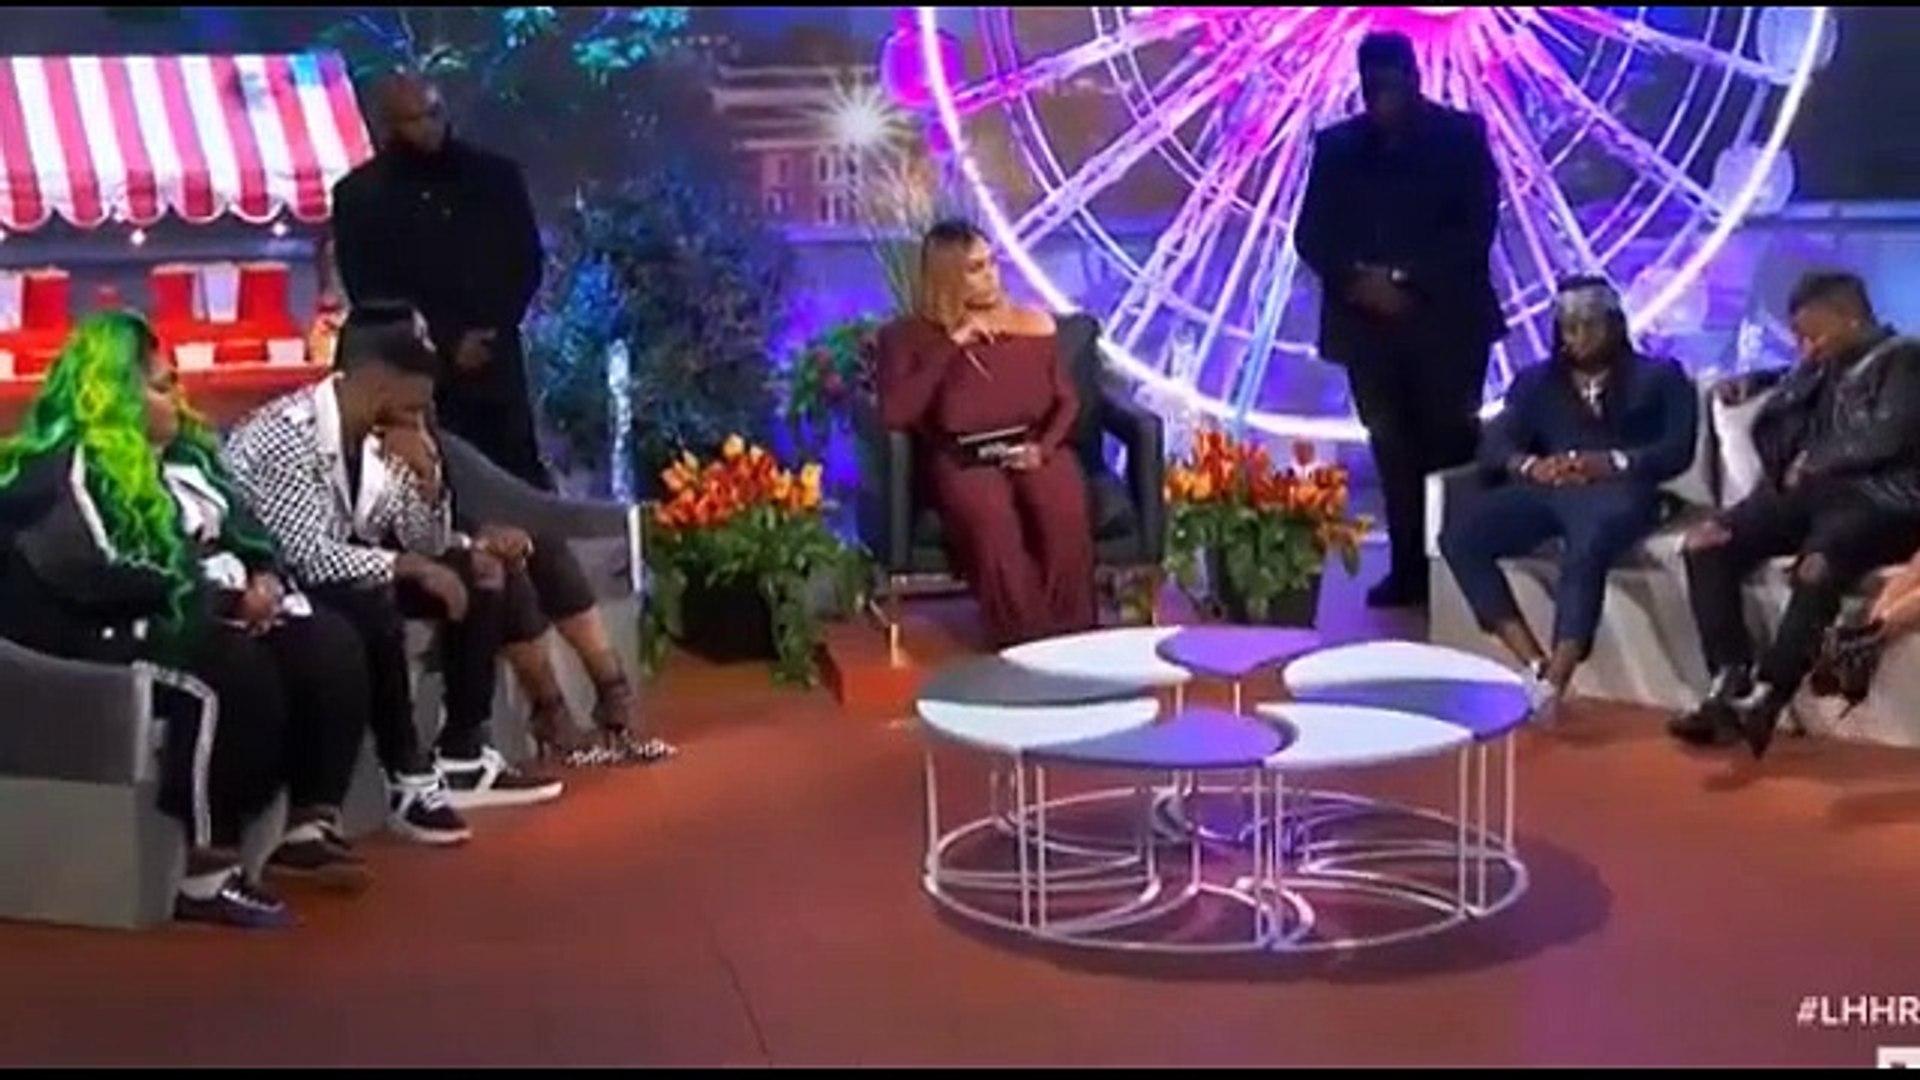 Love and Hip Hop Atlanta S07E18, Reunion: Part 2 - July 16, 2018 || Love and Hip Hop Atlanta S7 E18